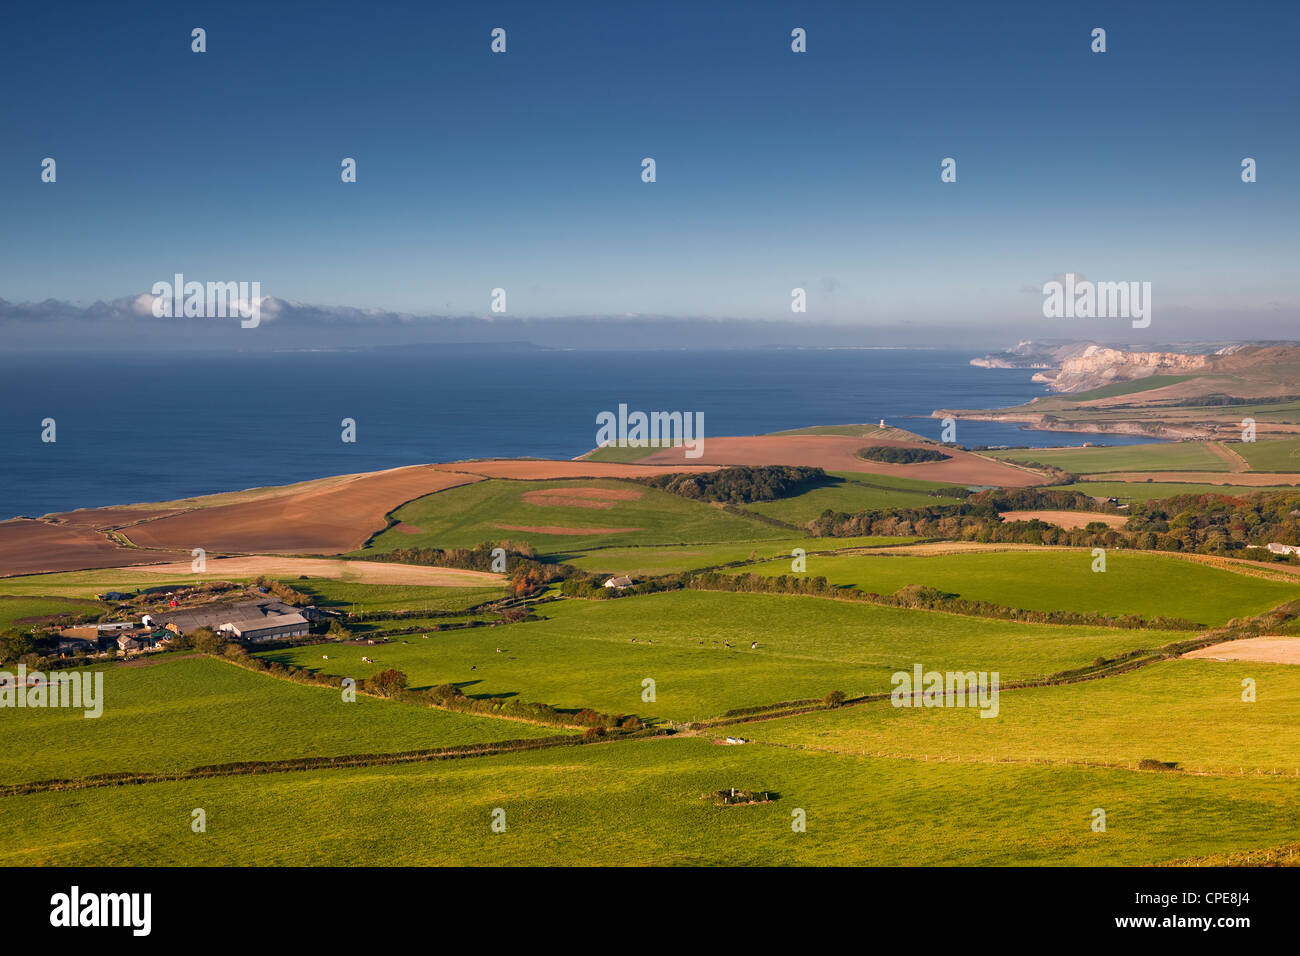 Looking across the Dorset coastline to Kimmeridge Bay and Clavell Tower, Jurassic Coast, Dorset, England, United - Stock Image